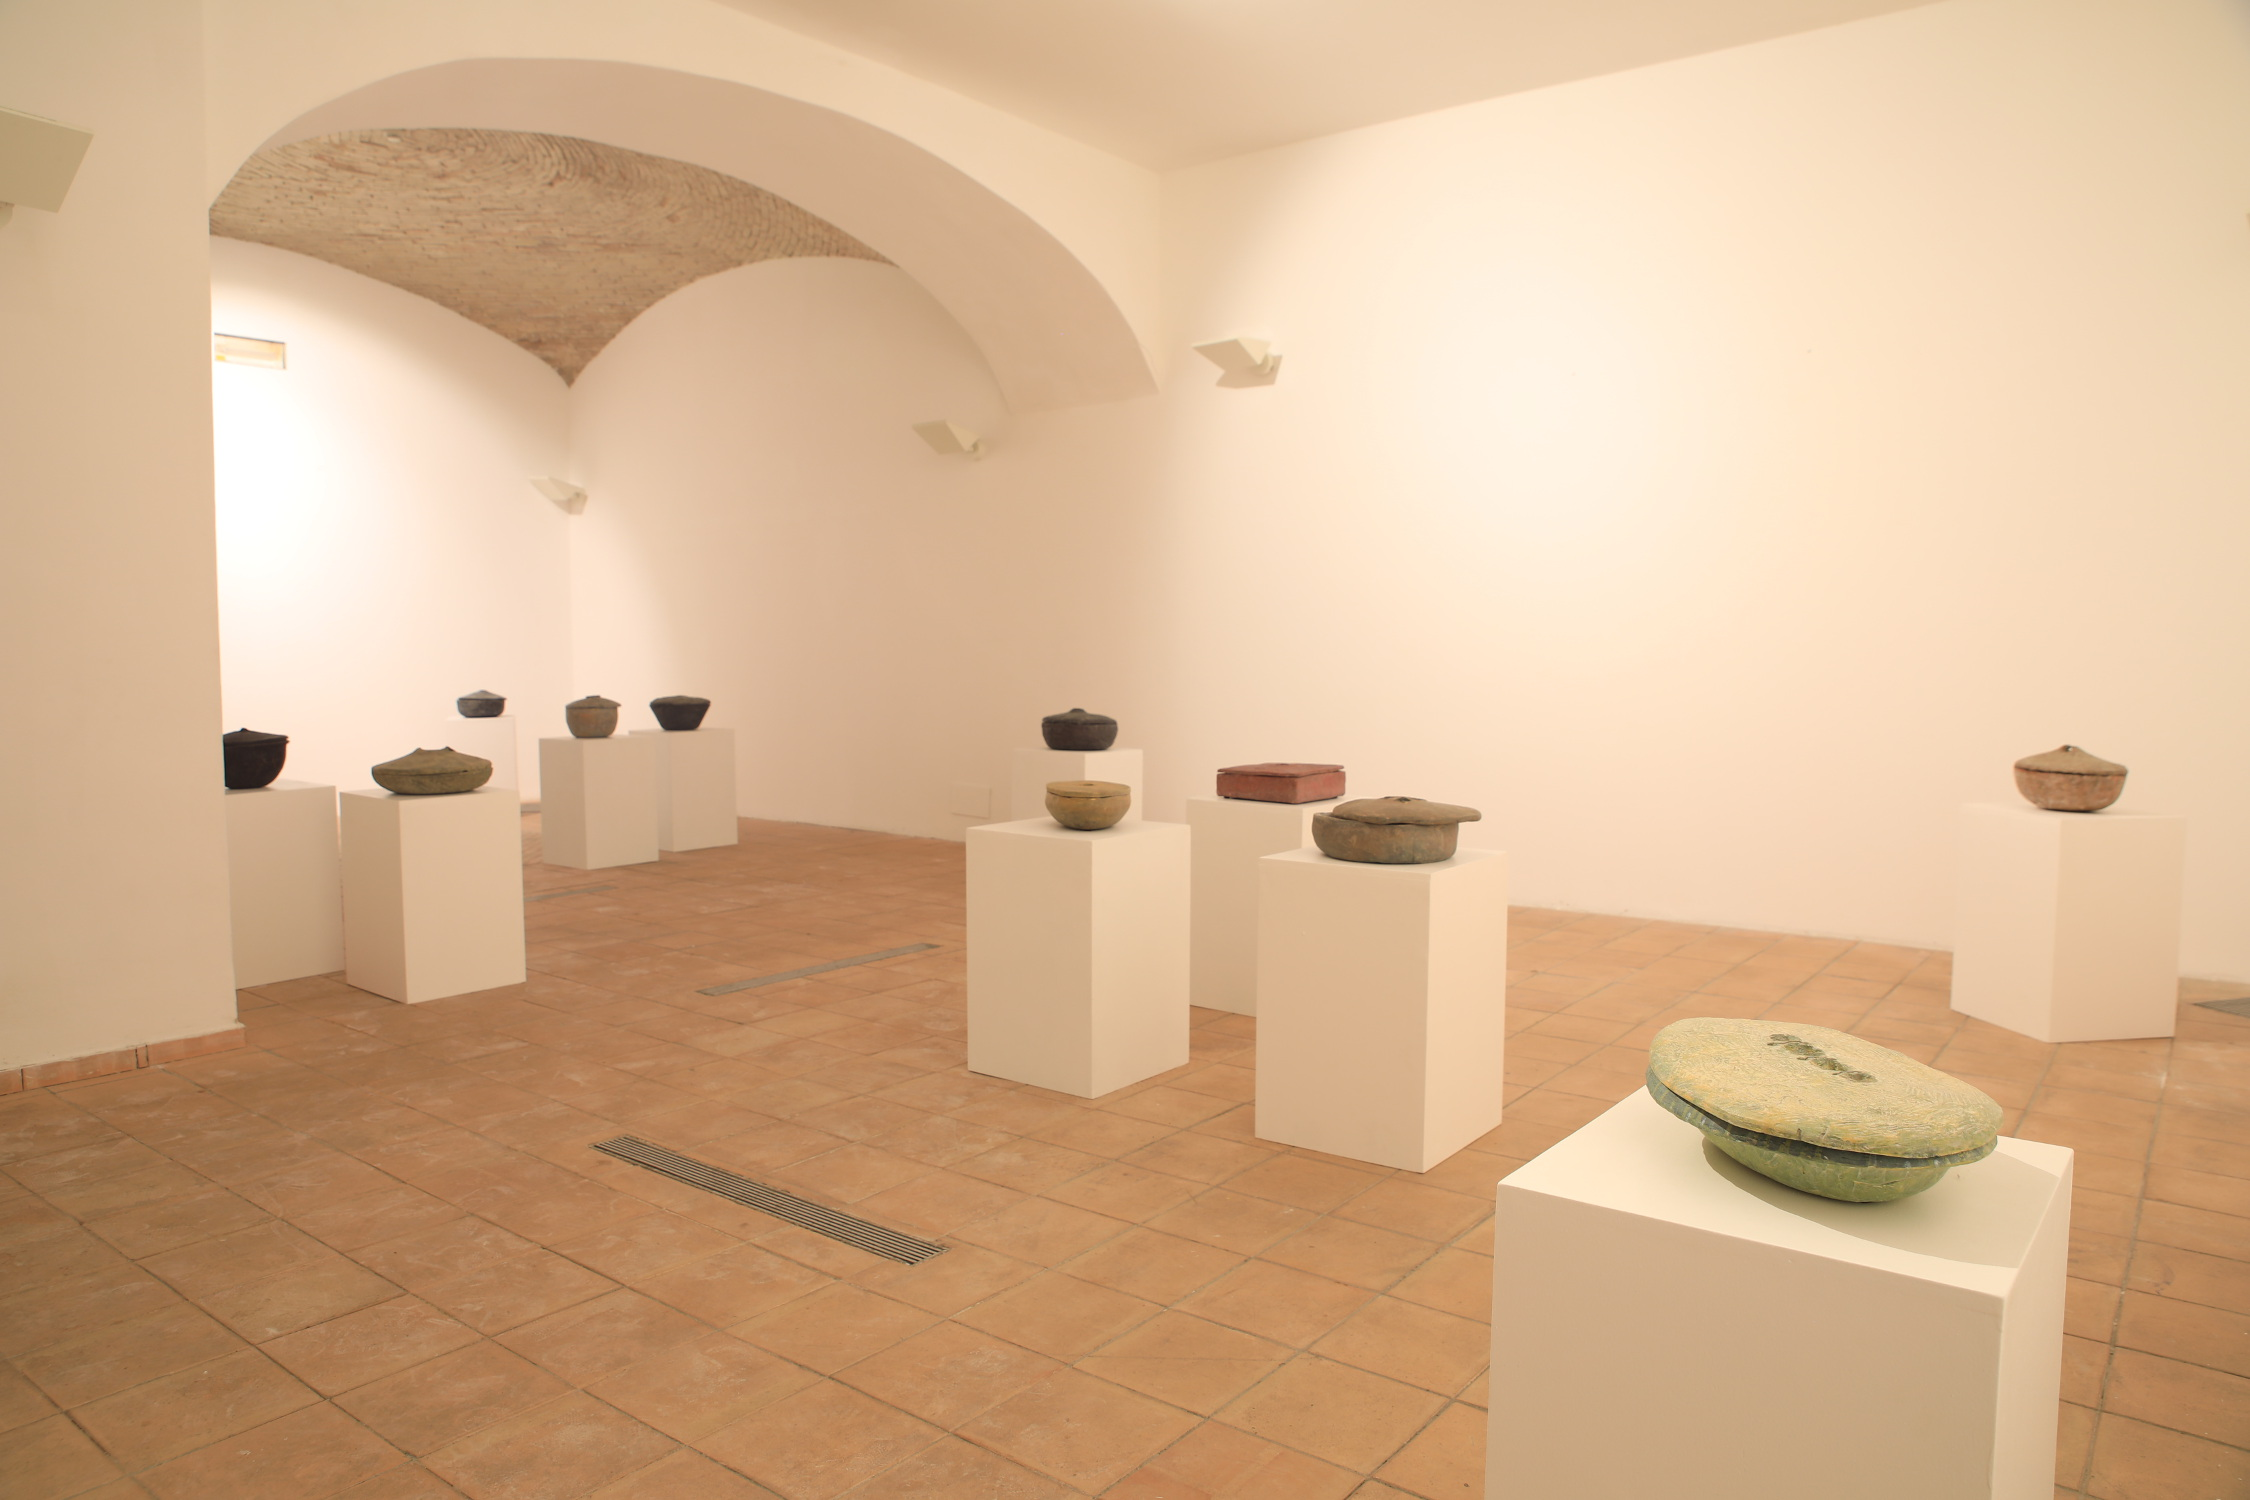 Antonio Saladino. Reperti contemporanei, 2018-2019 | installation view, Museo MARCA, Catanzaro